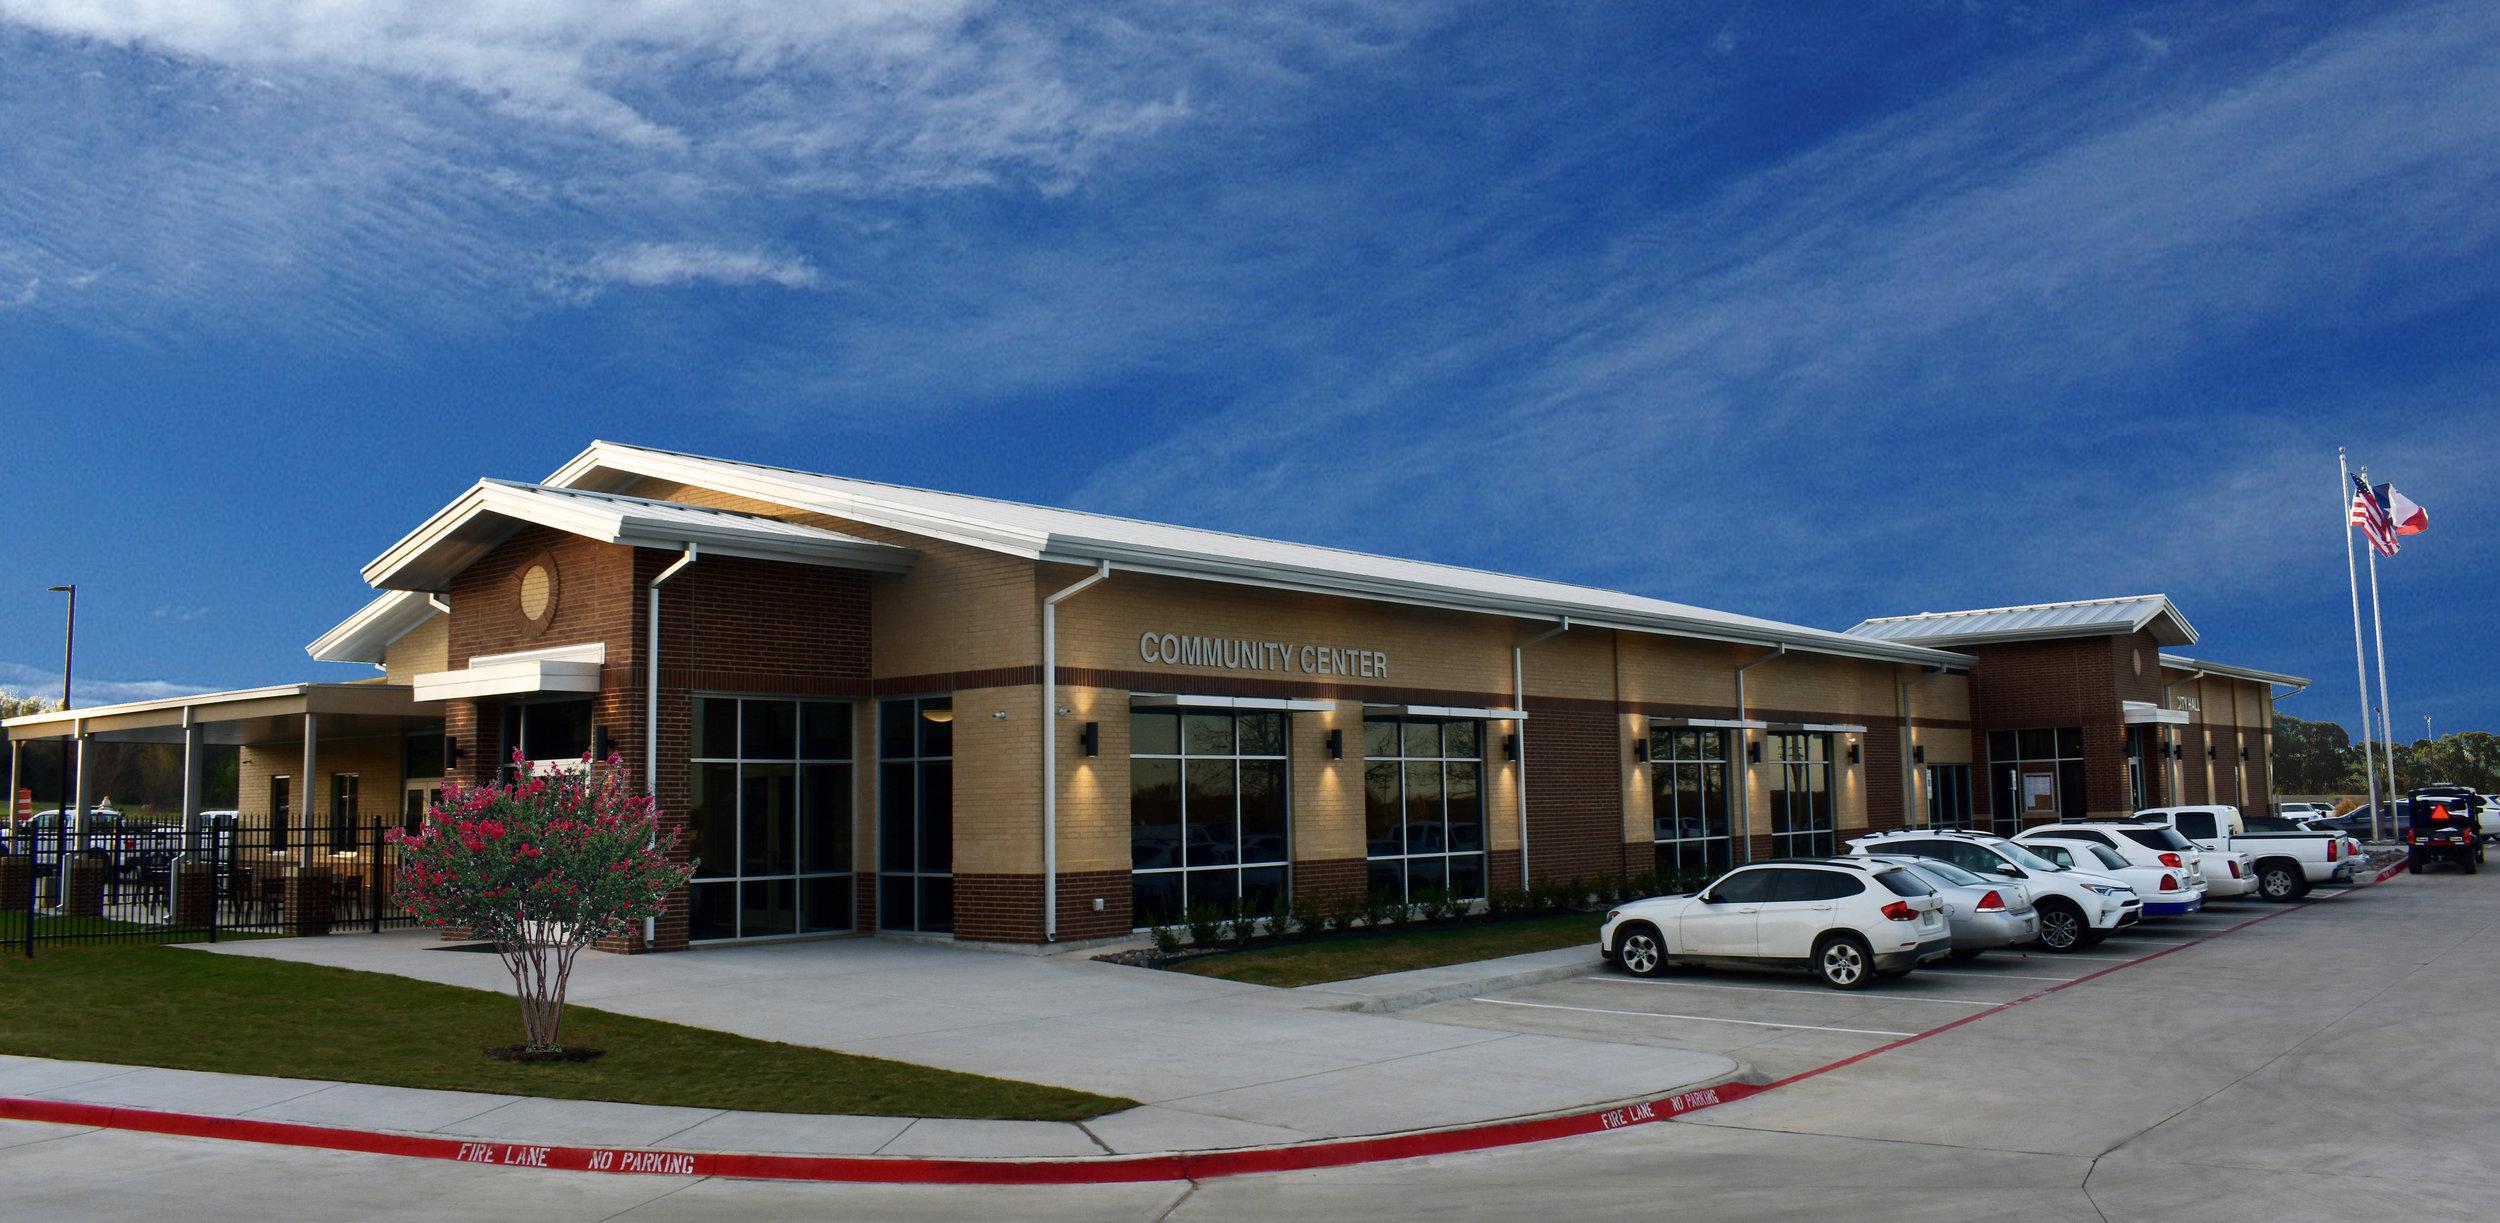 Keene Community Center - Keene, Texas